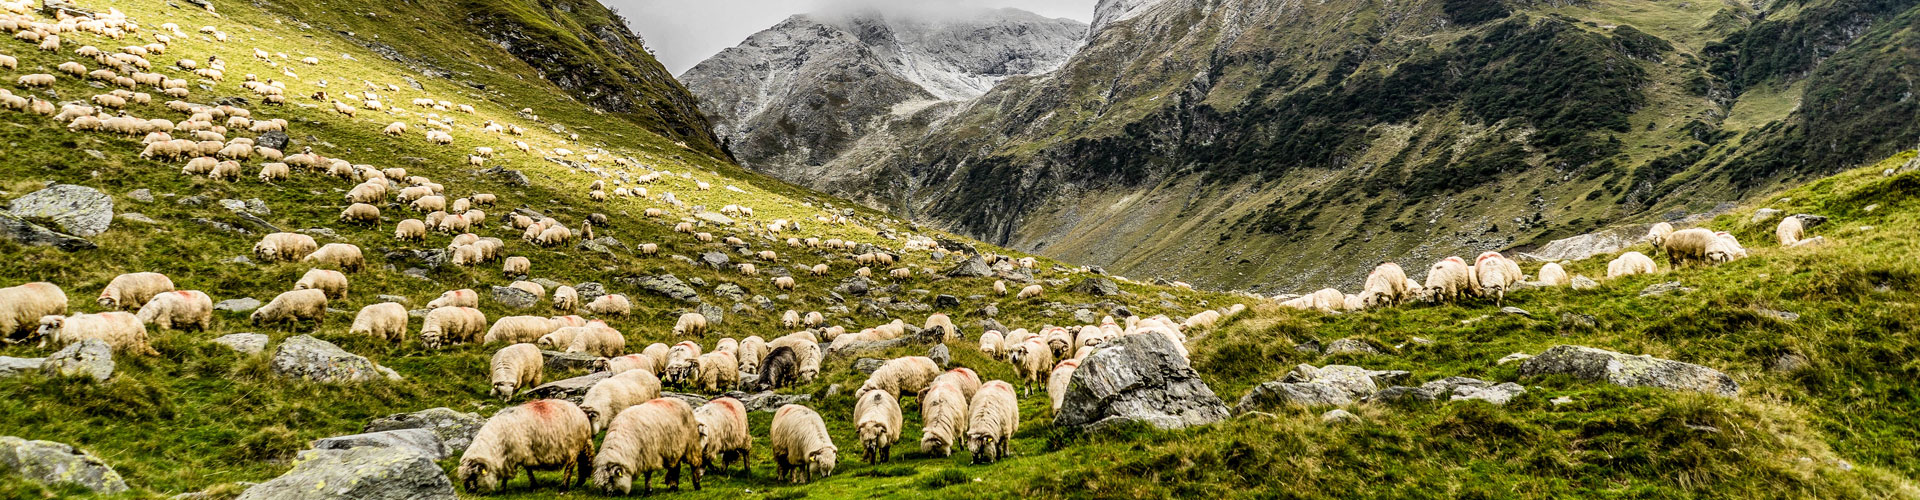 Slider monte ovejas